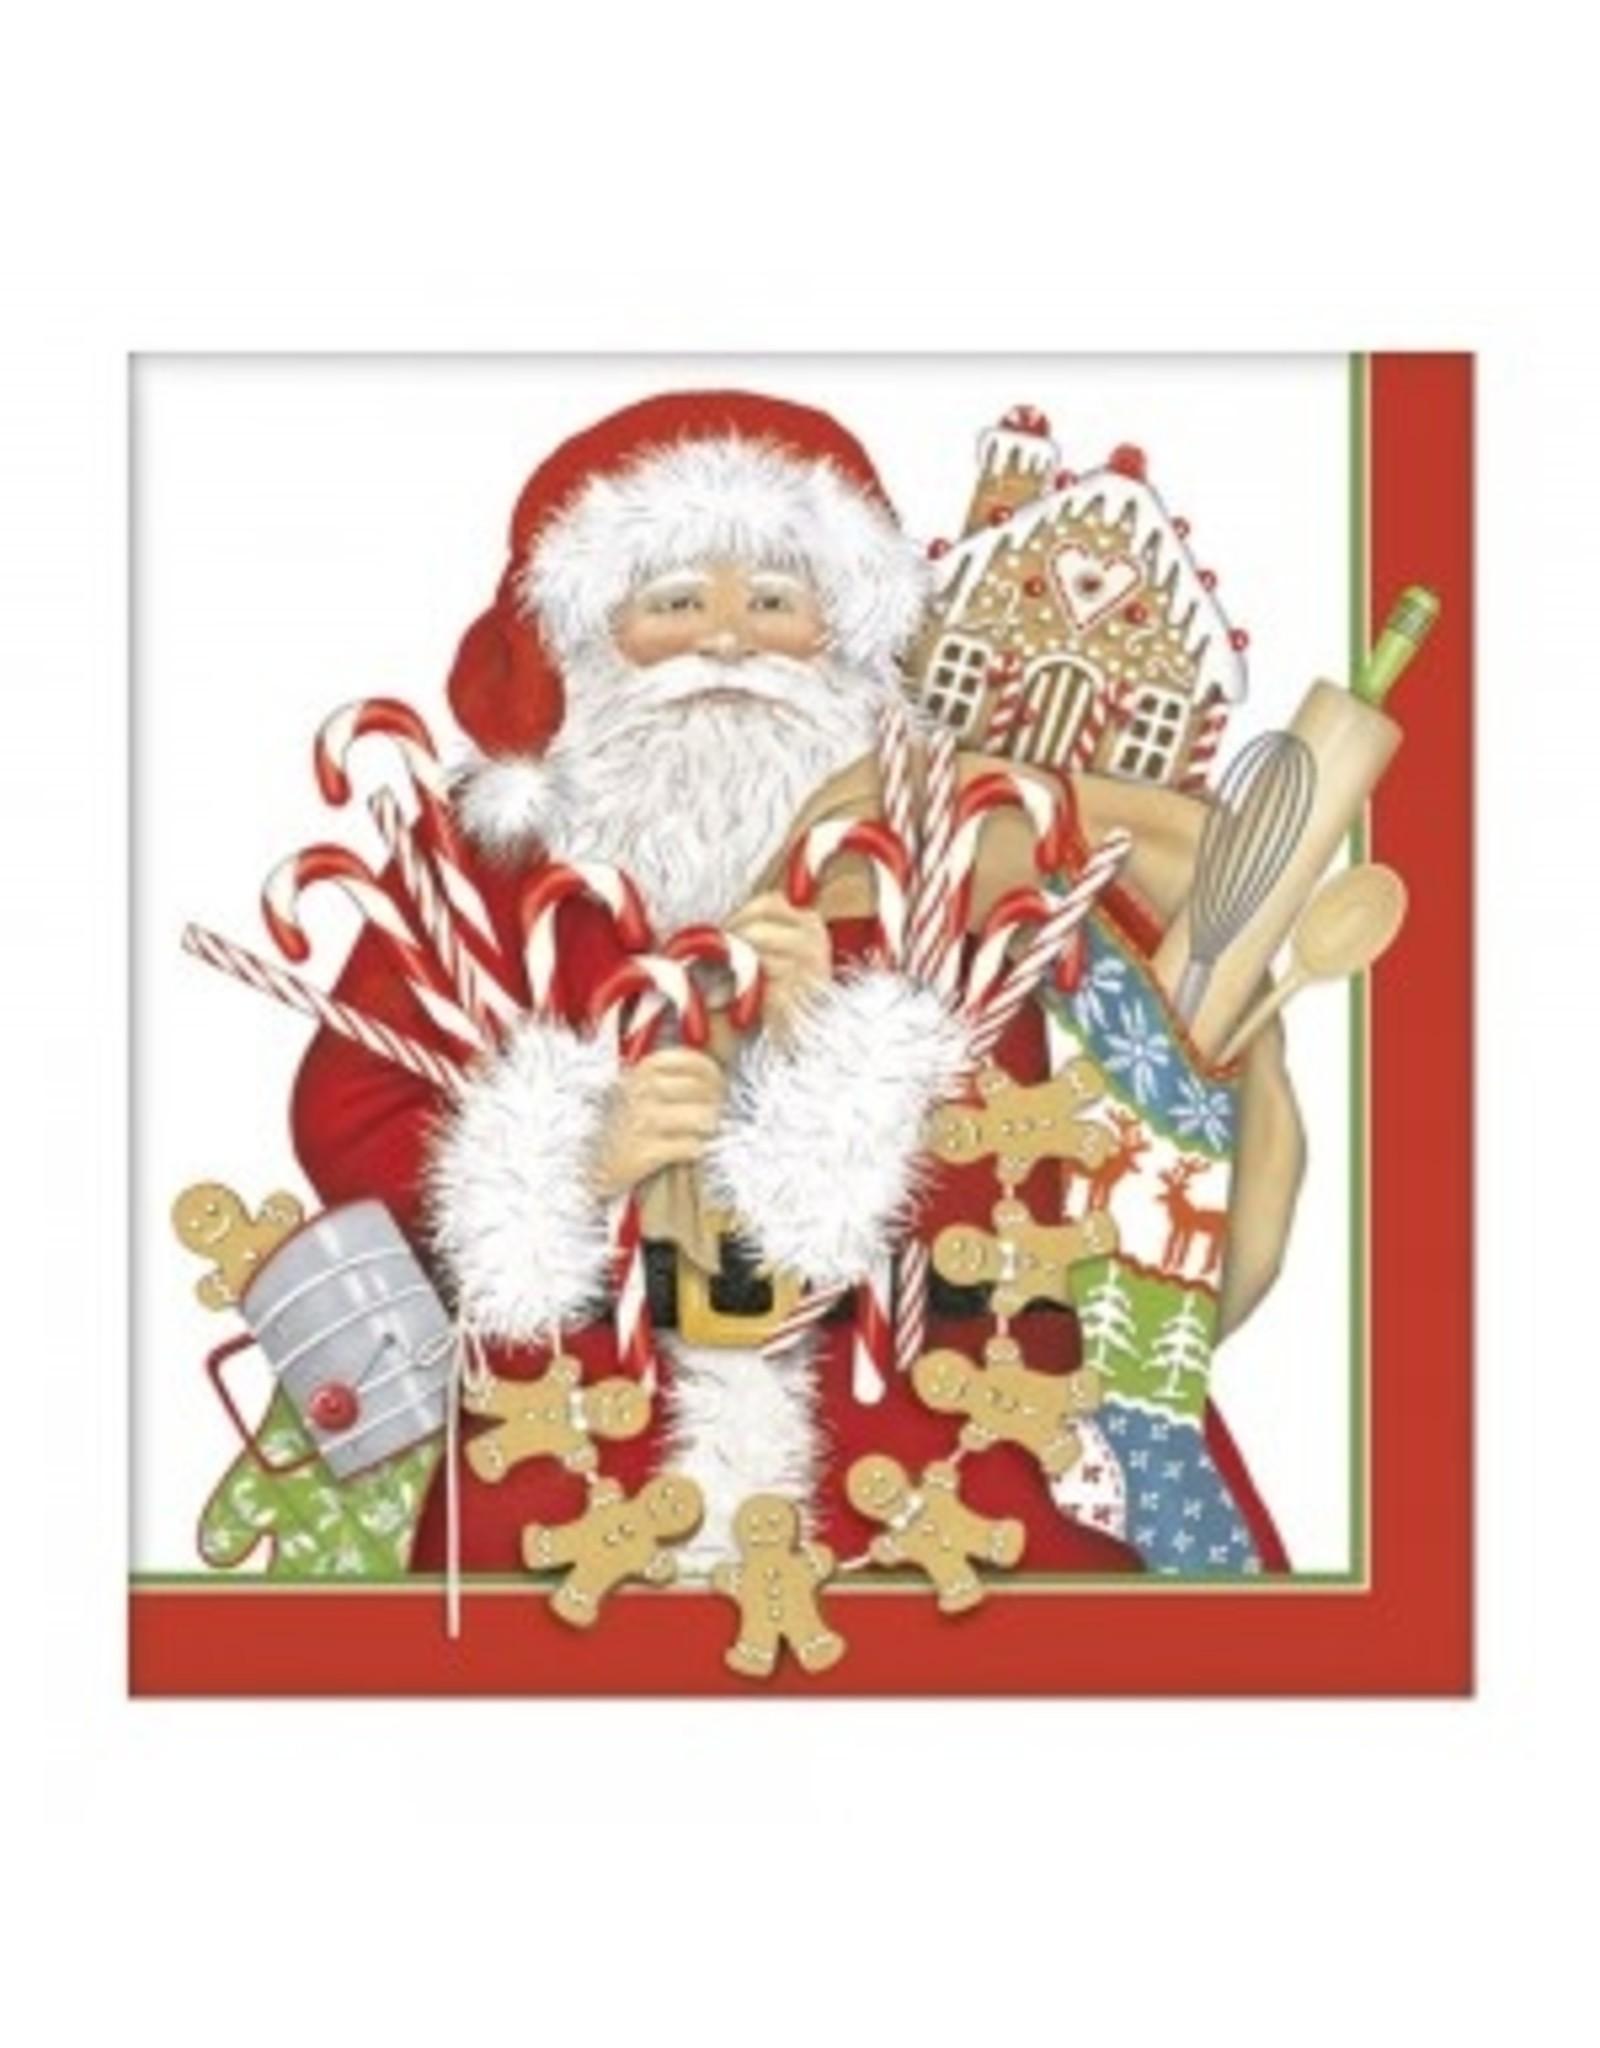 Mary Lake-Thompson Gingerbread Santa Sugar Cookie Mix/Towel